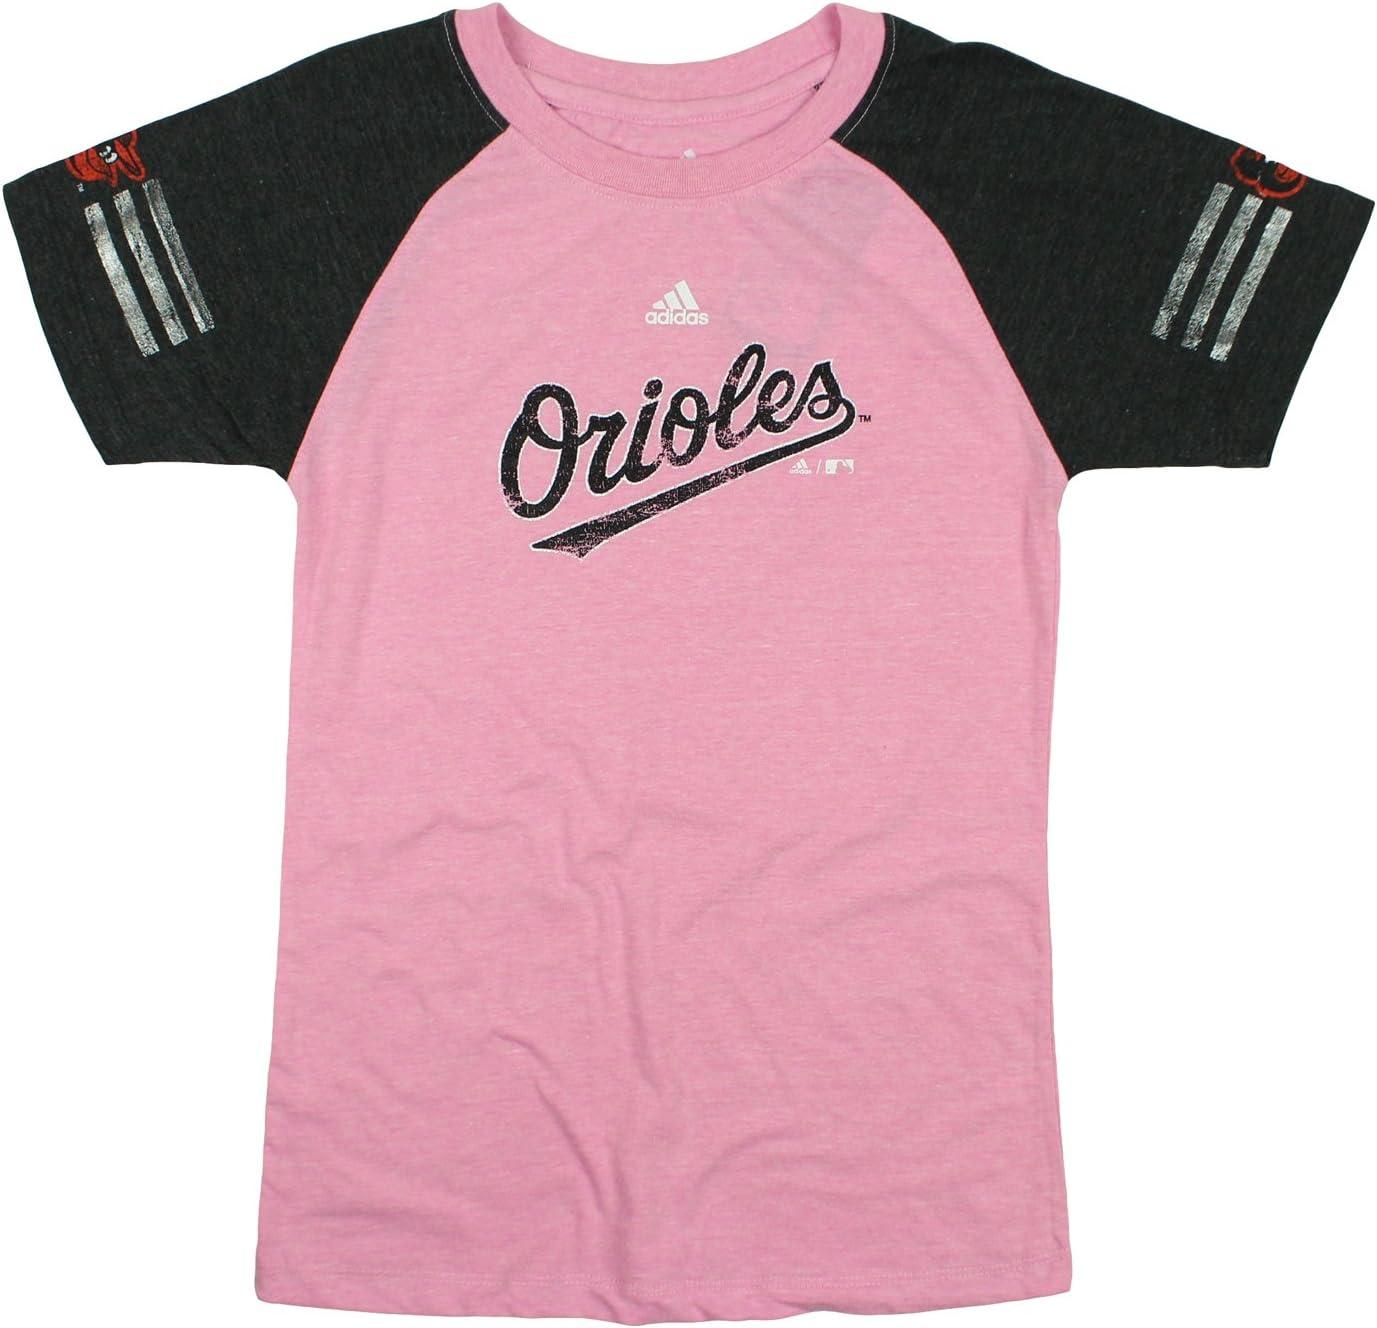 adidas Baltimore Orioles MLB Youth Big Girls Fashion Jersey Tee - Pink